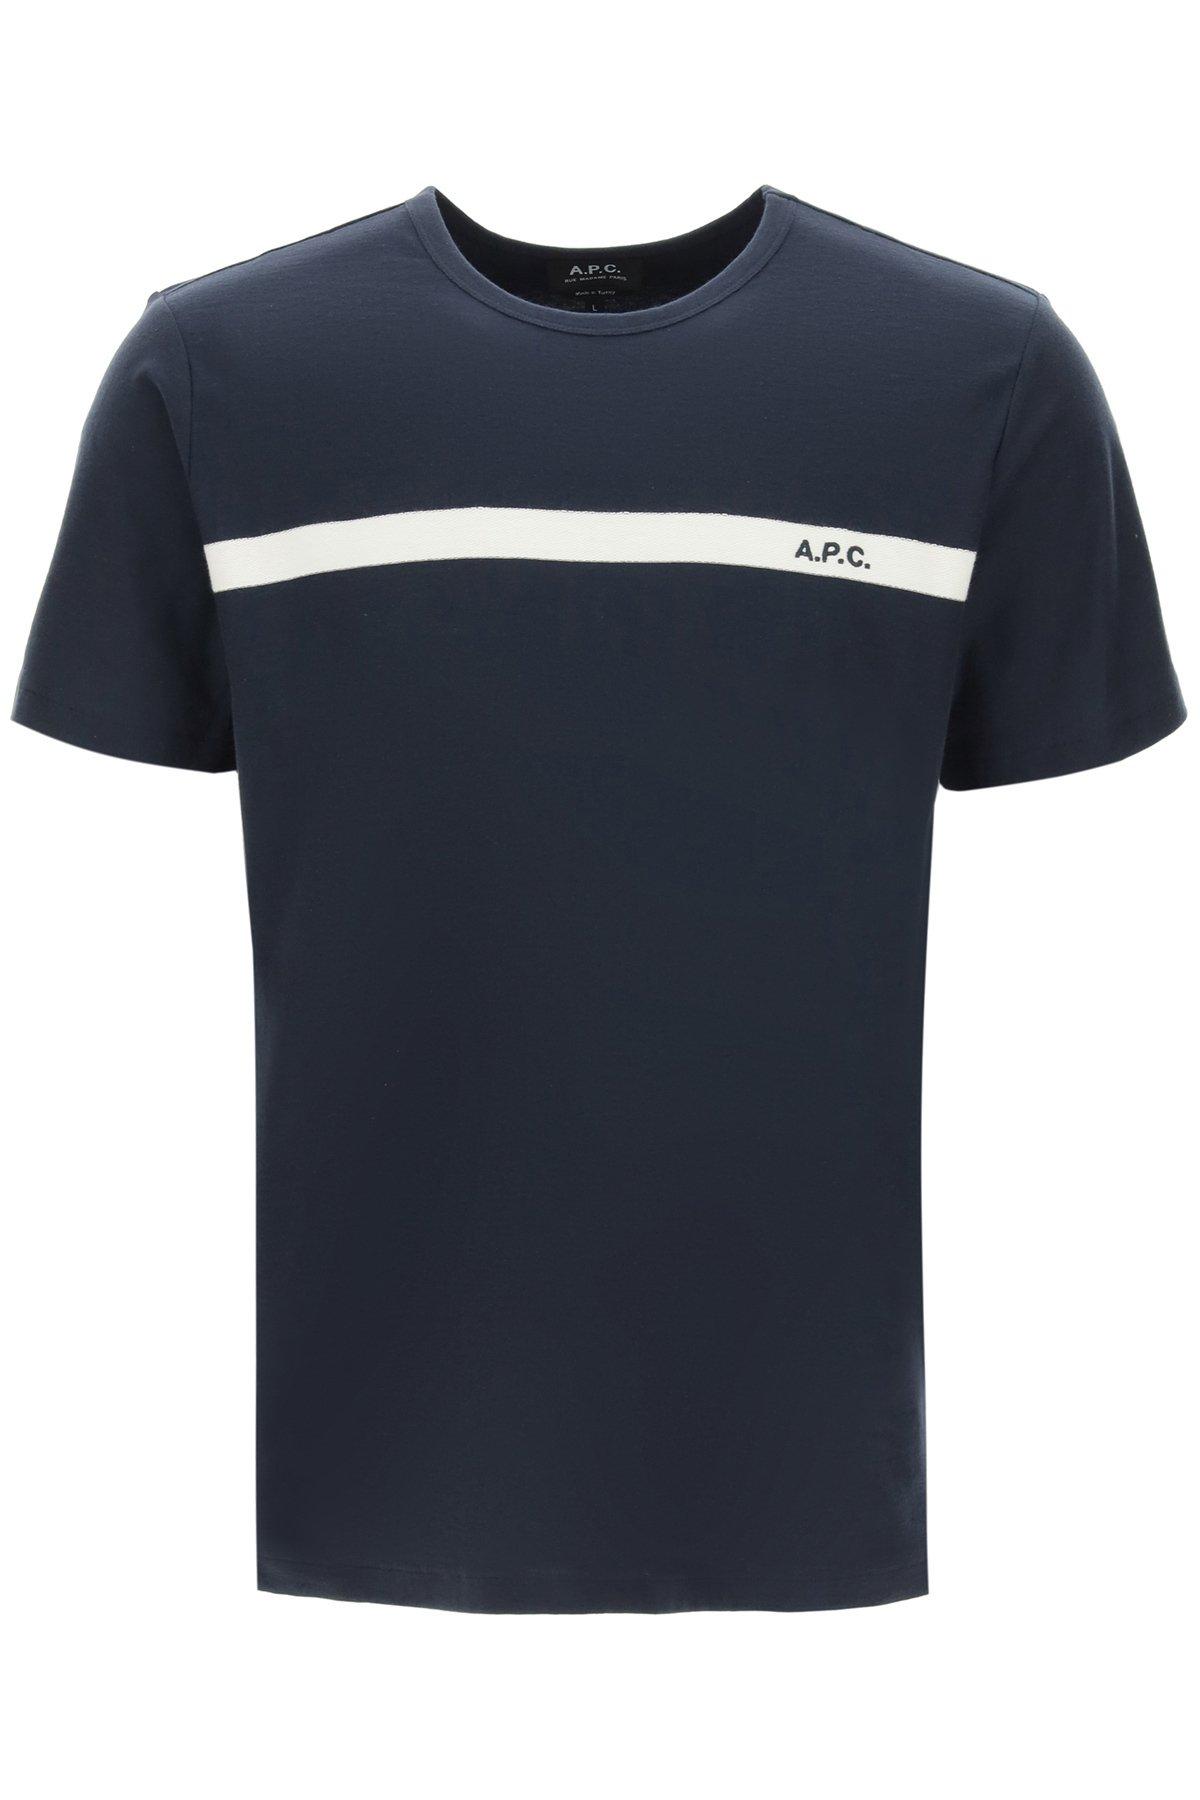 A.p.c. t-shirt yukata